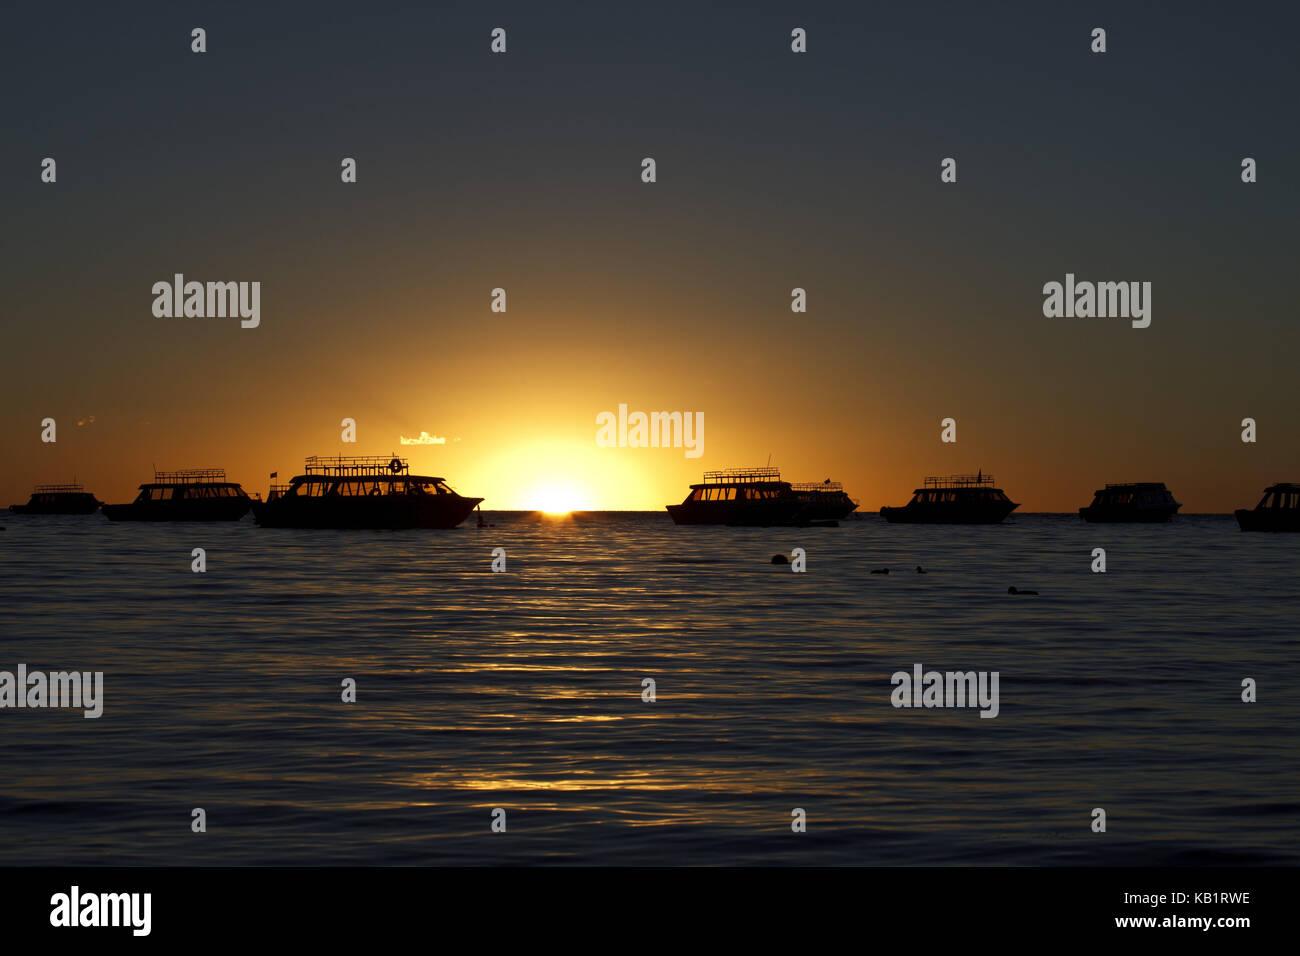 Bolivia, Titicacasee, Copacabana, sundown, boats, - Stock Image